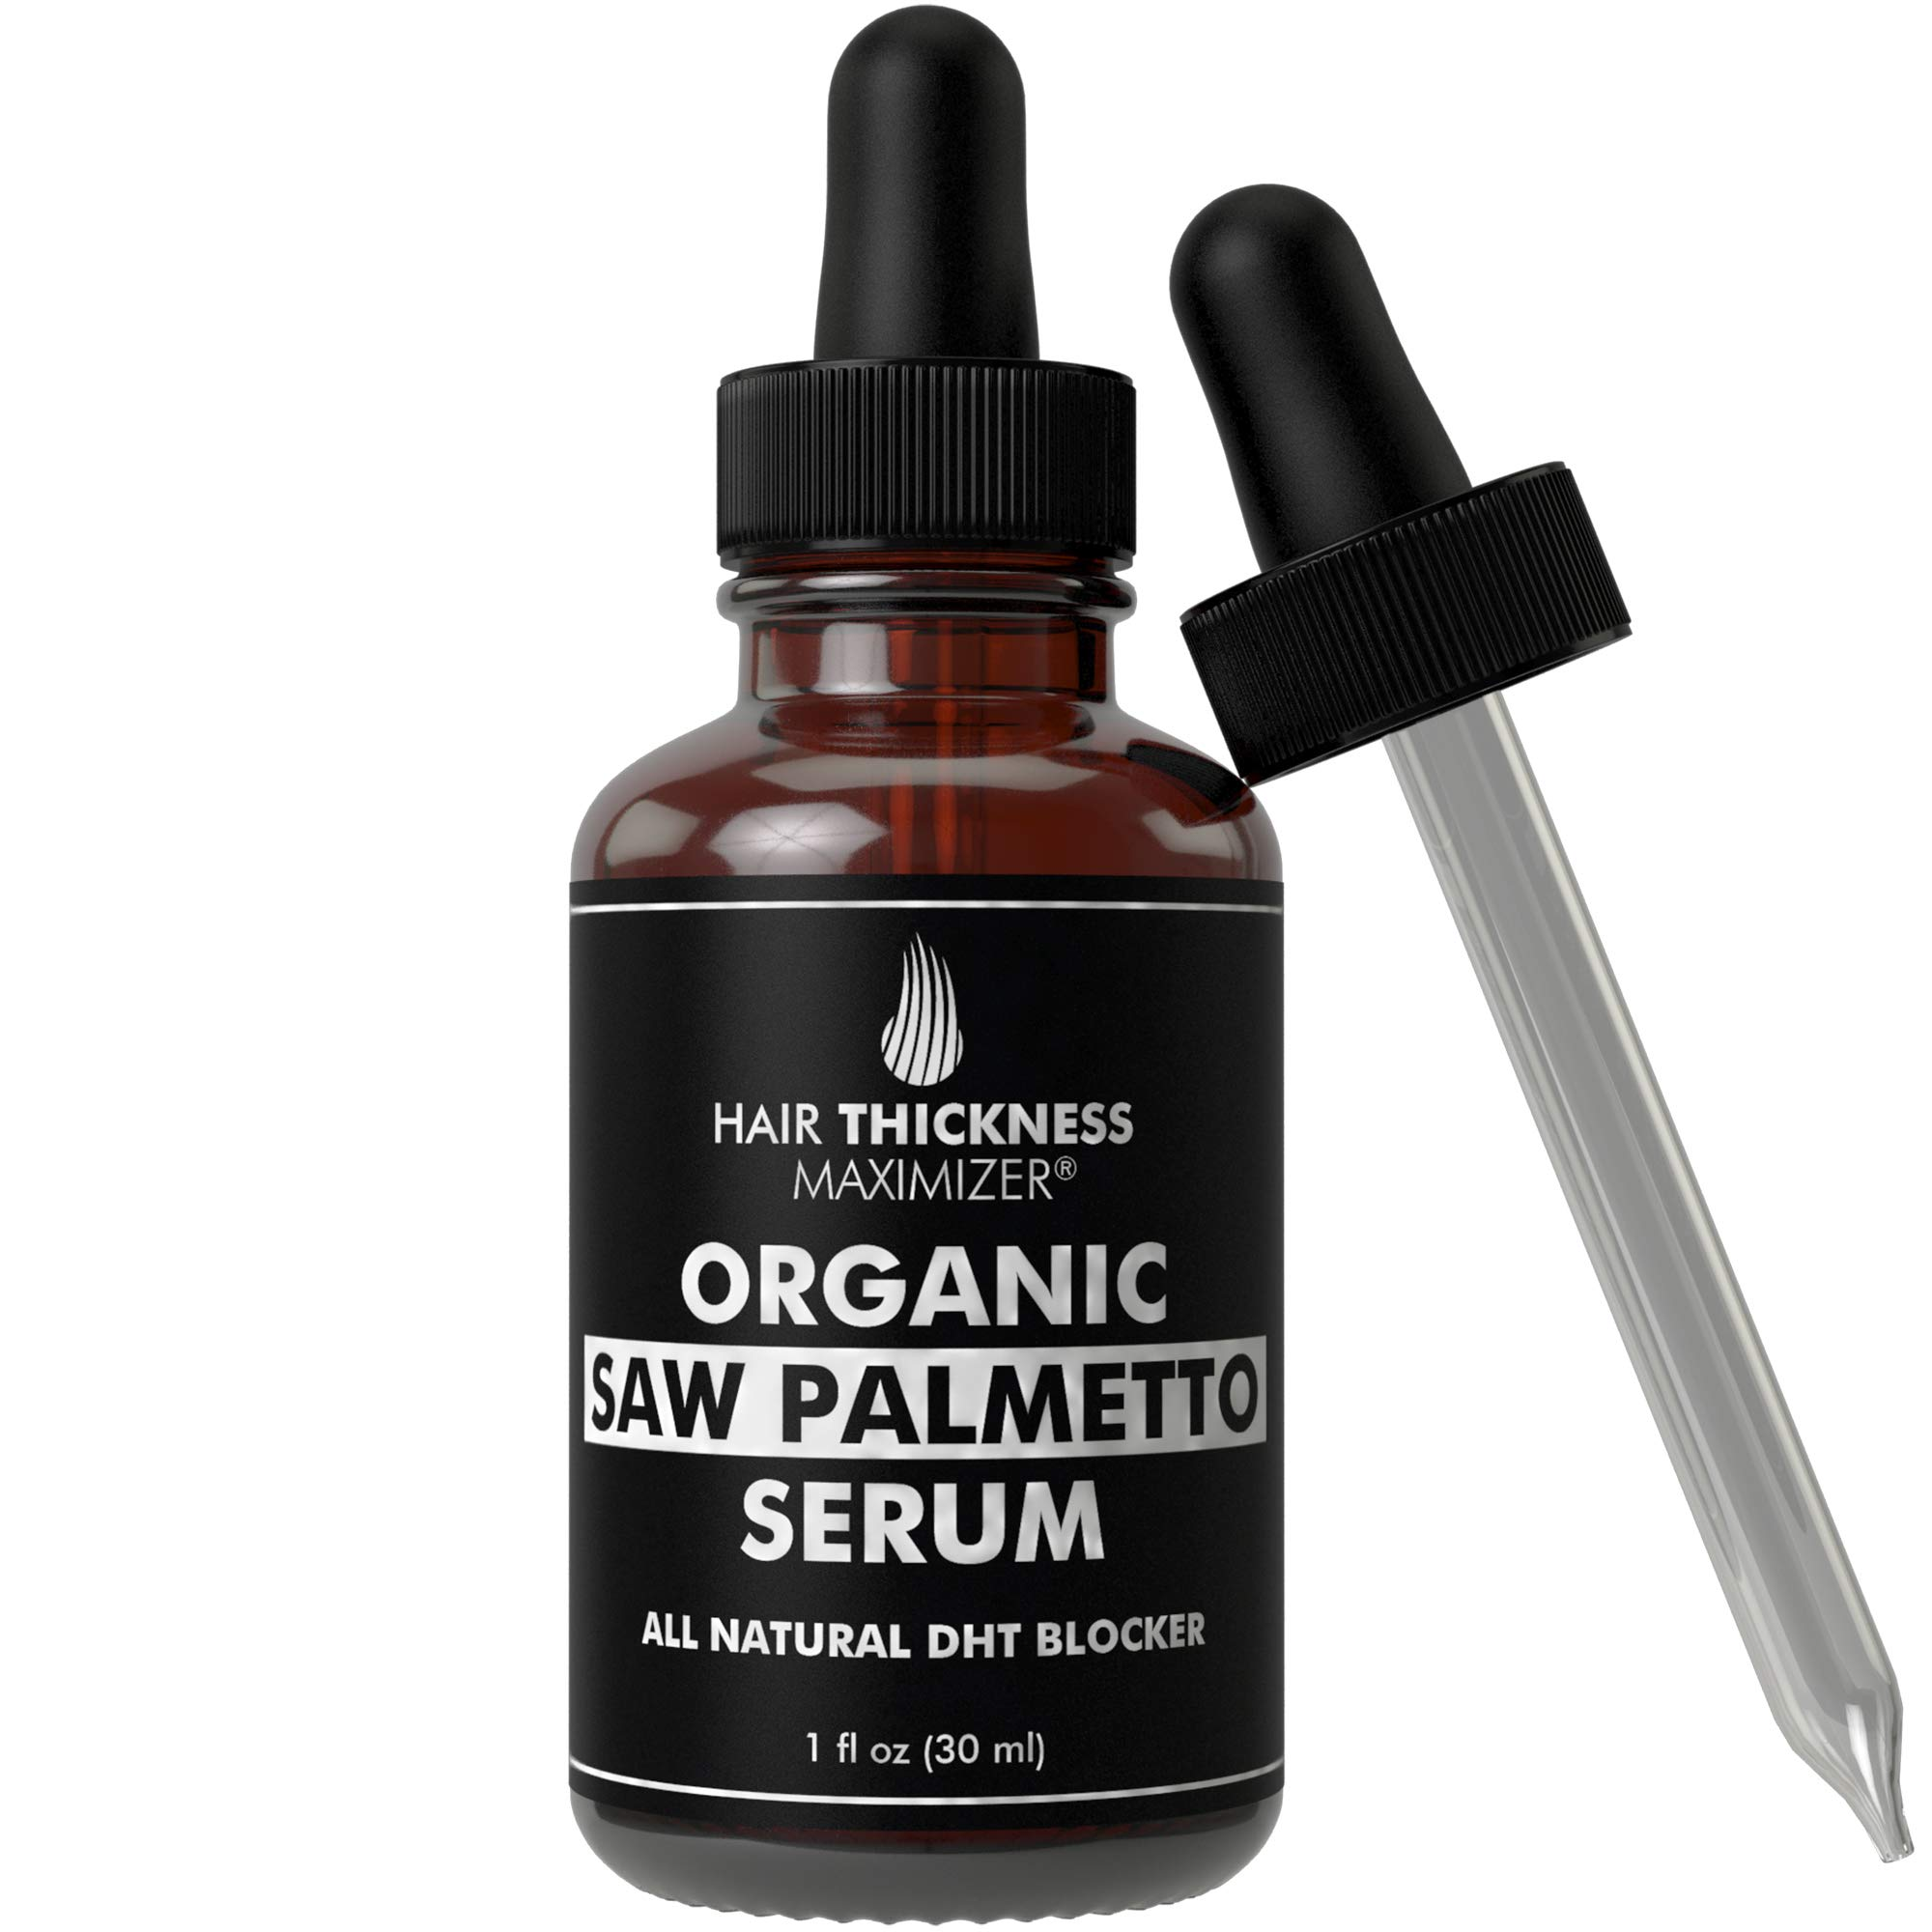 Organic Saw Palmetto Oil Serum. Stop Hair Loss Now by Hair Thickness Maximizer. Best Treatment for Hair Thinning. Hair Thickening Oils with Organic Pumpkin Seed Oil, Moringa Oil, Baobab Liquid (1 oz) by Hair Thickness Maximizer